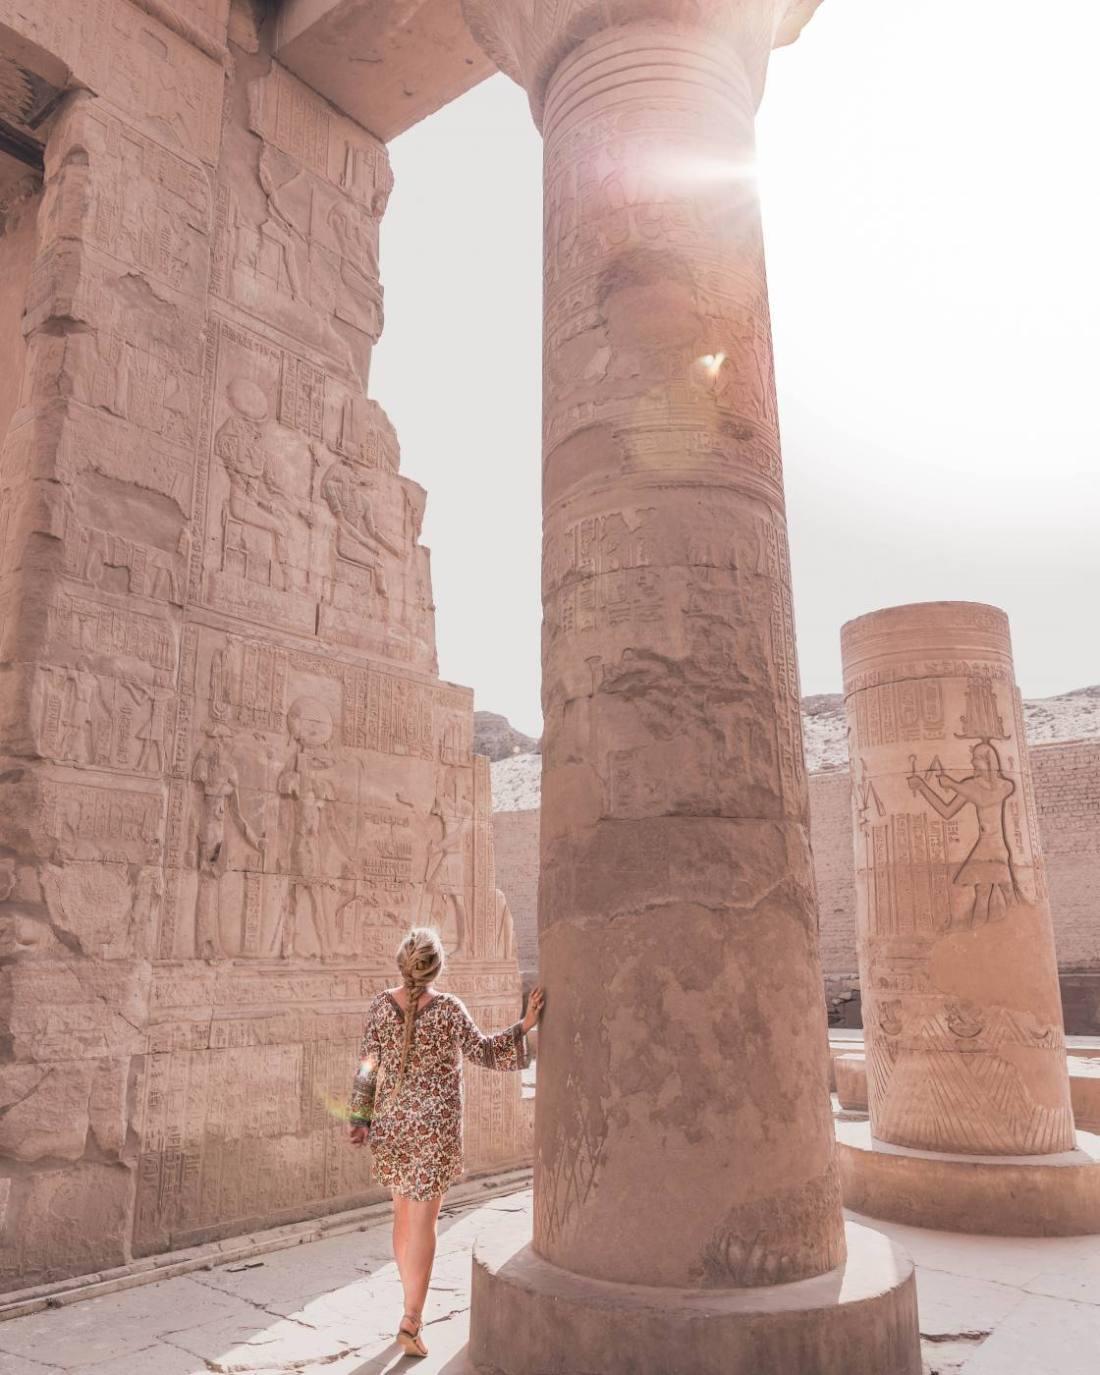 egypt travel, egypt photography, 2 weeks in egypt